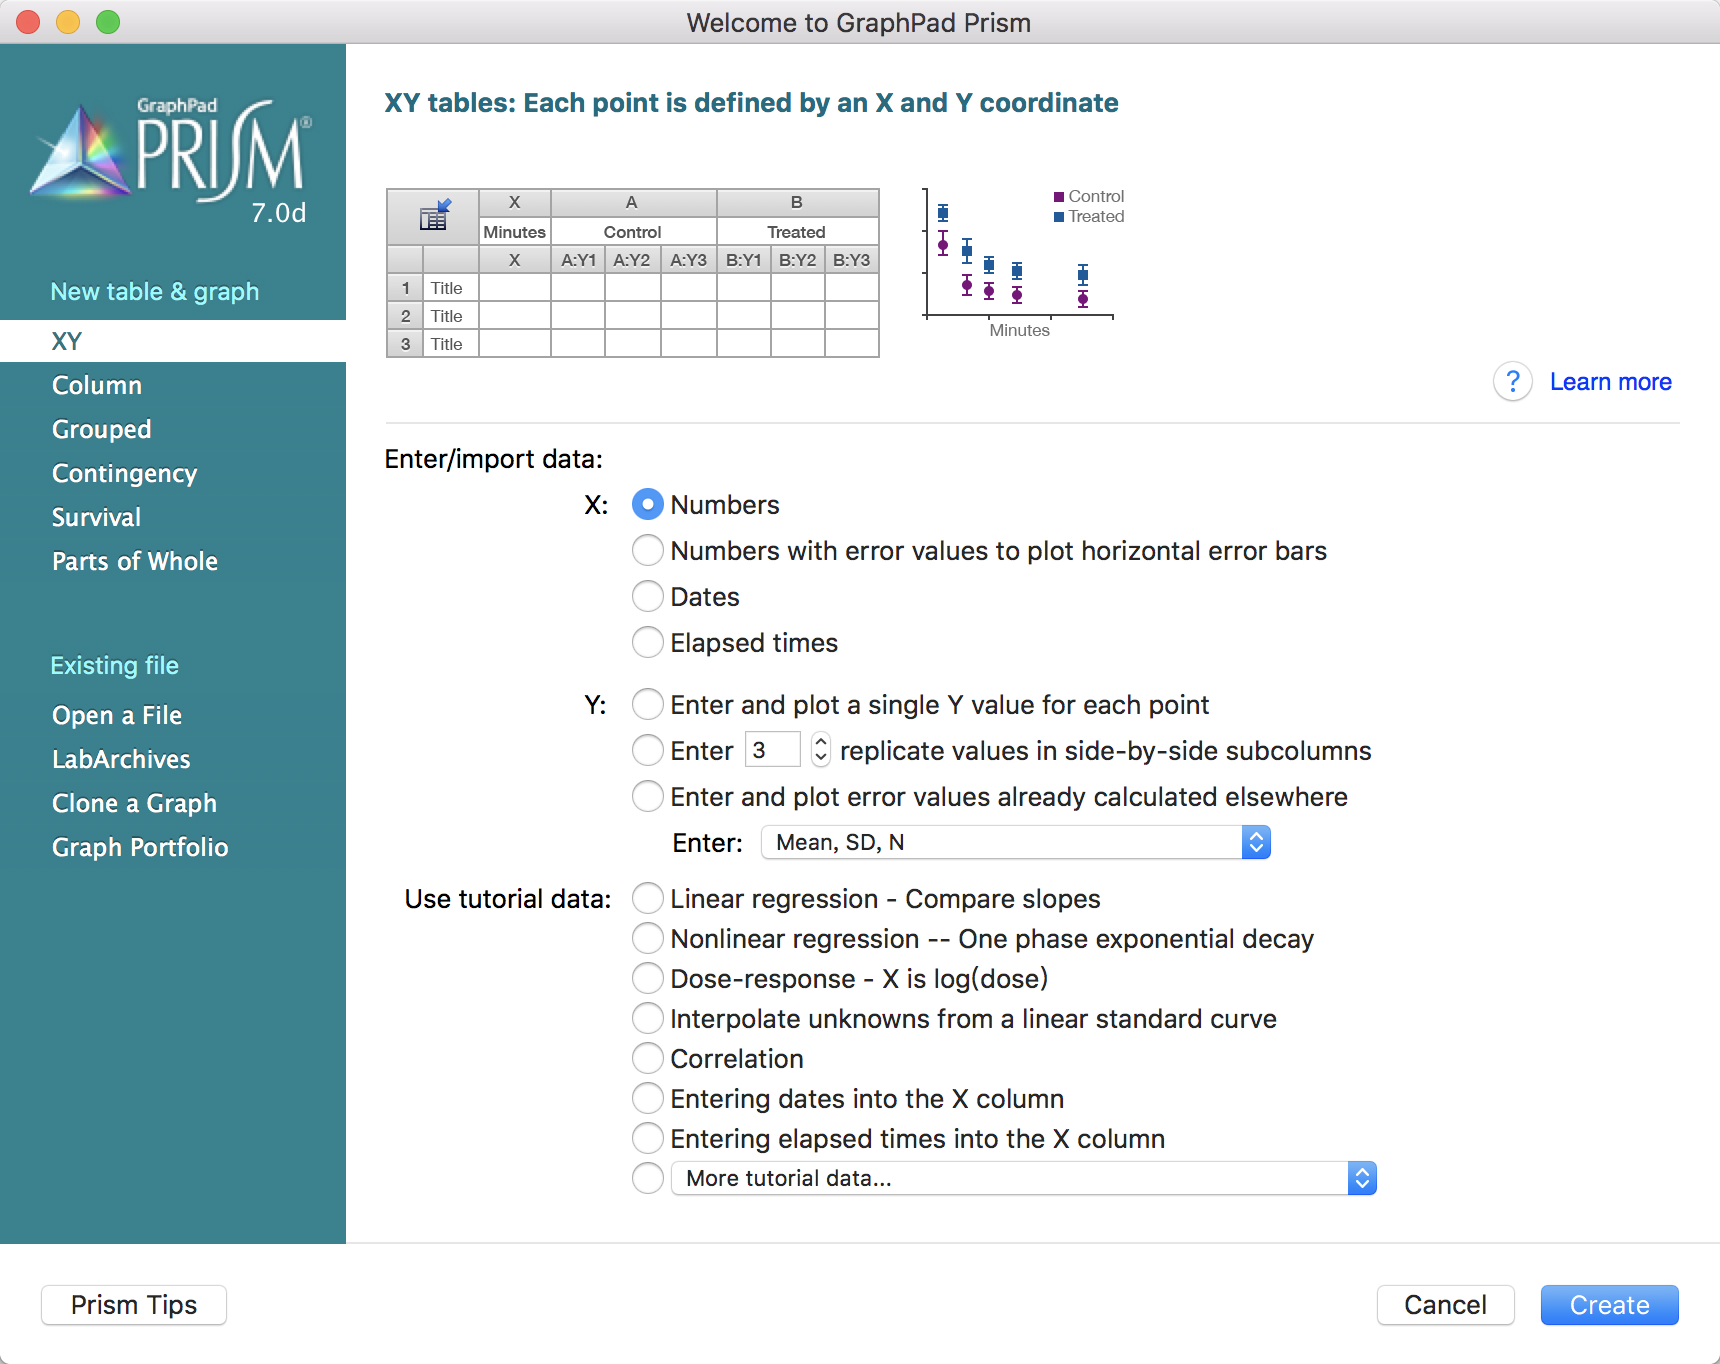 GraphPad Prism 9.0.1科学图形和非线性回归曲线工具